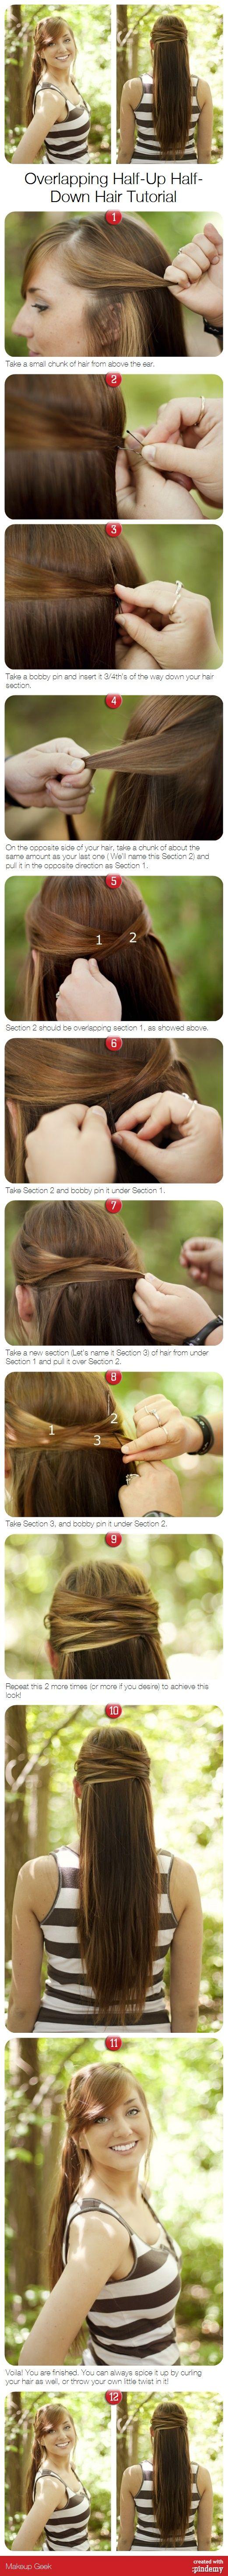 Overlapping Half-Up Half-Down Hair Tutorial